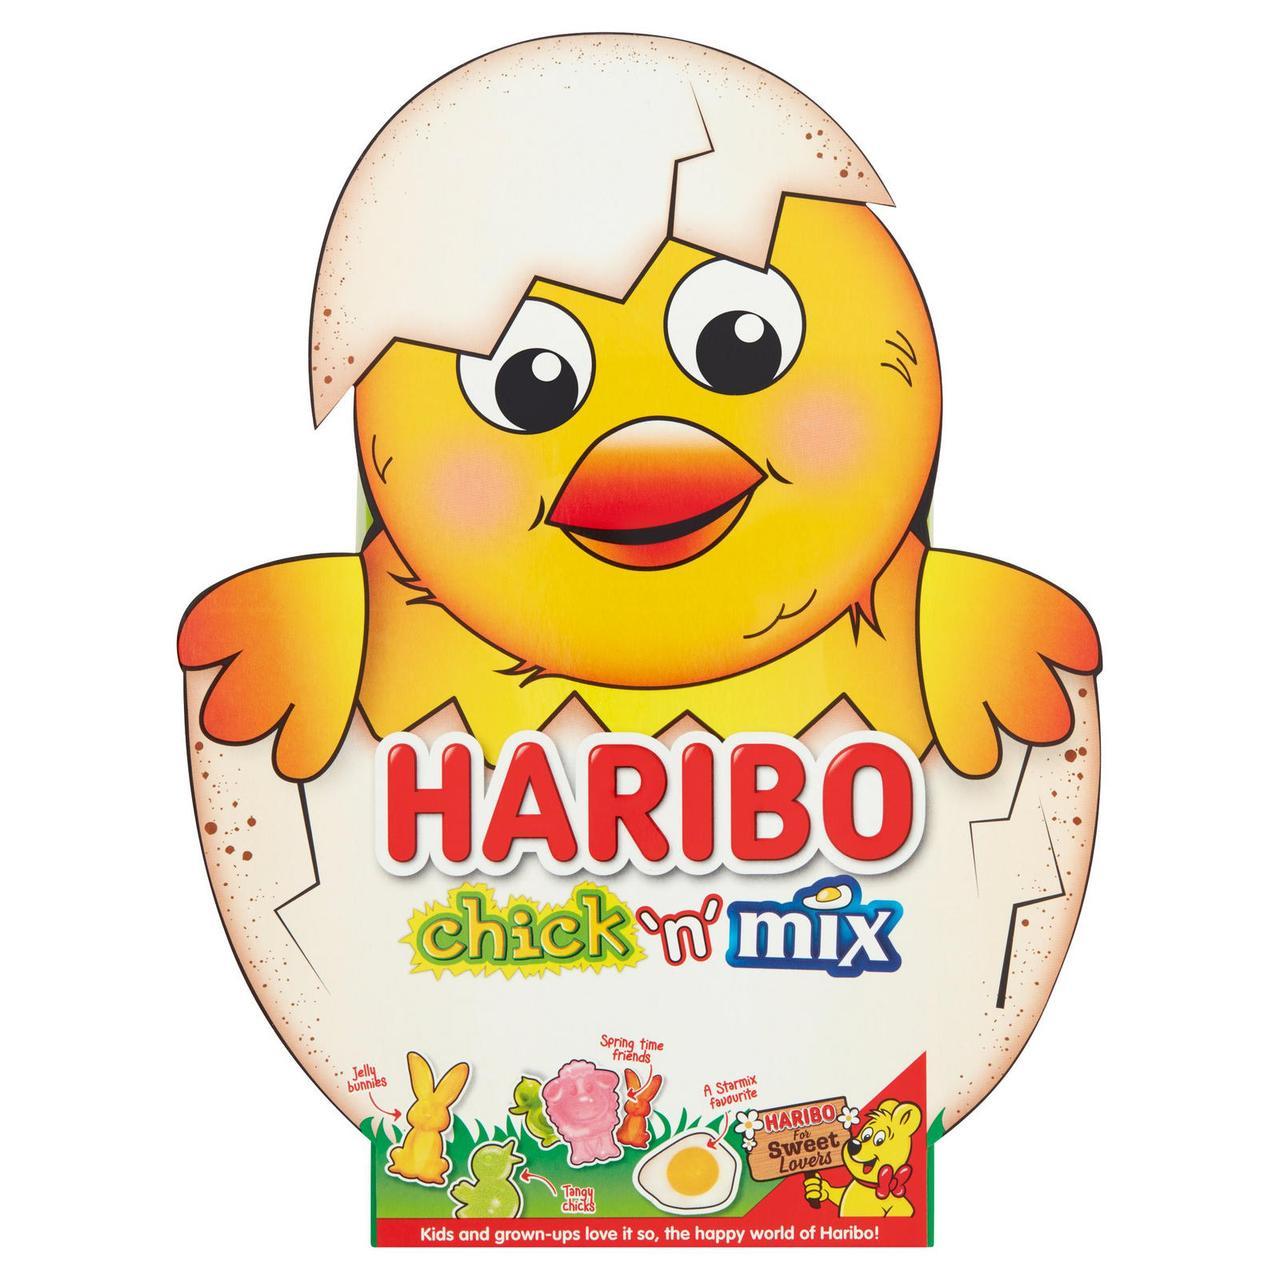 Haribo Chick N Mix Gift Box, 200g